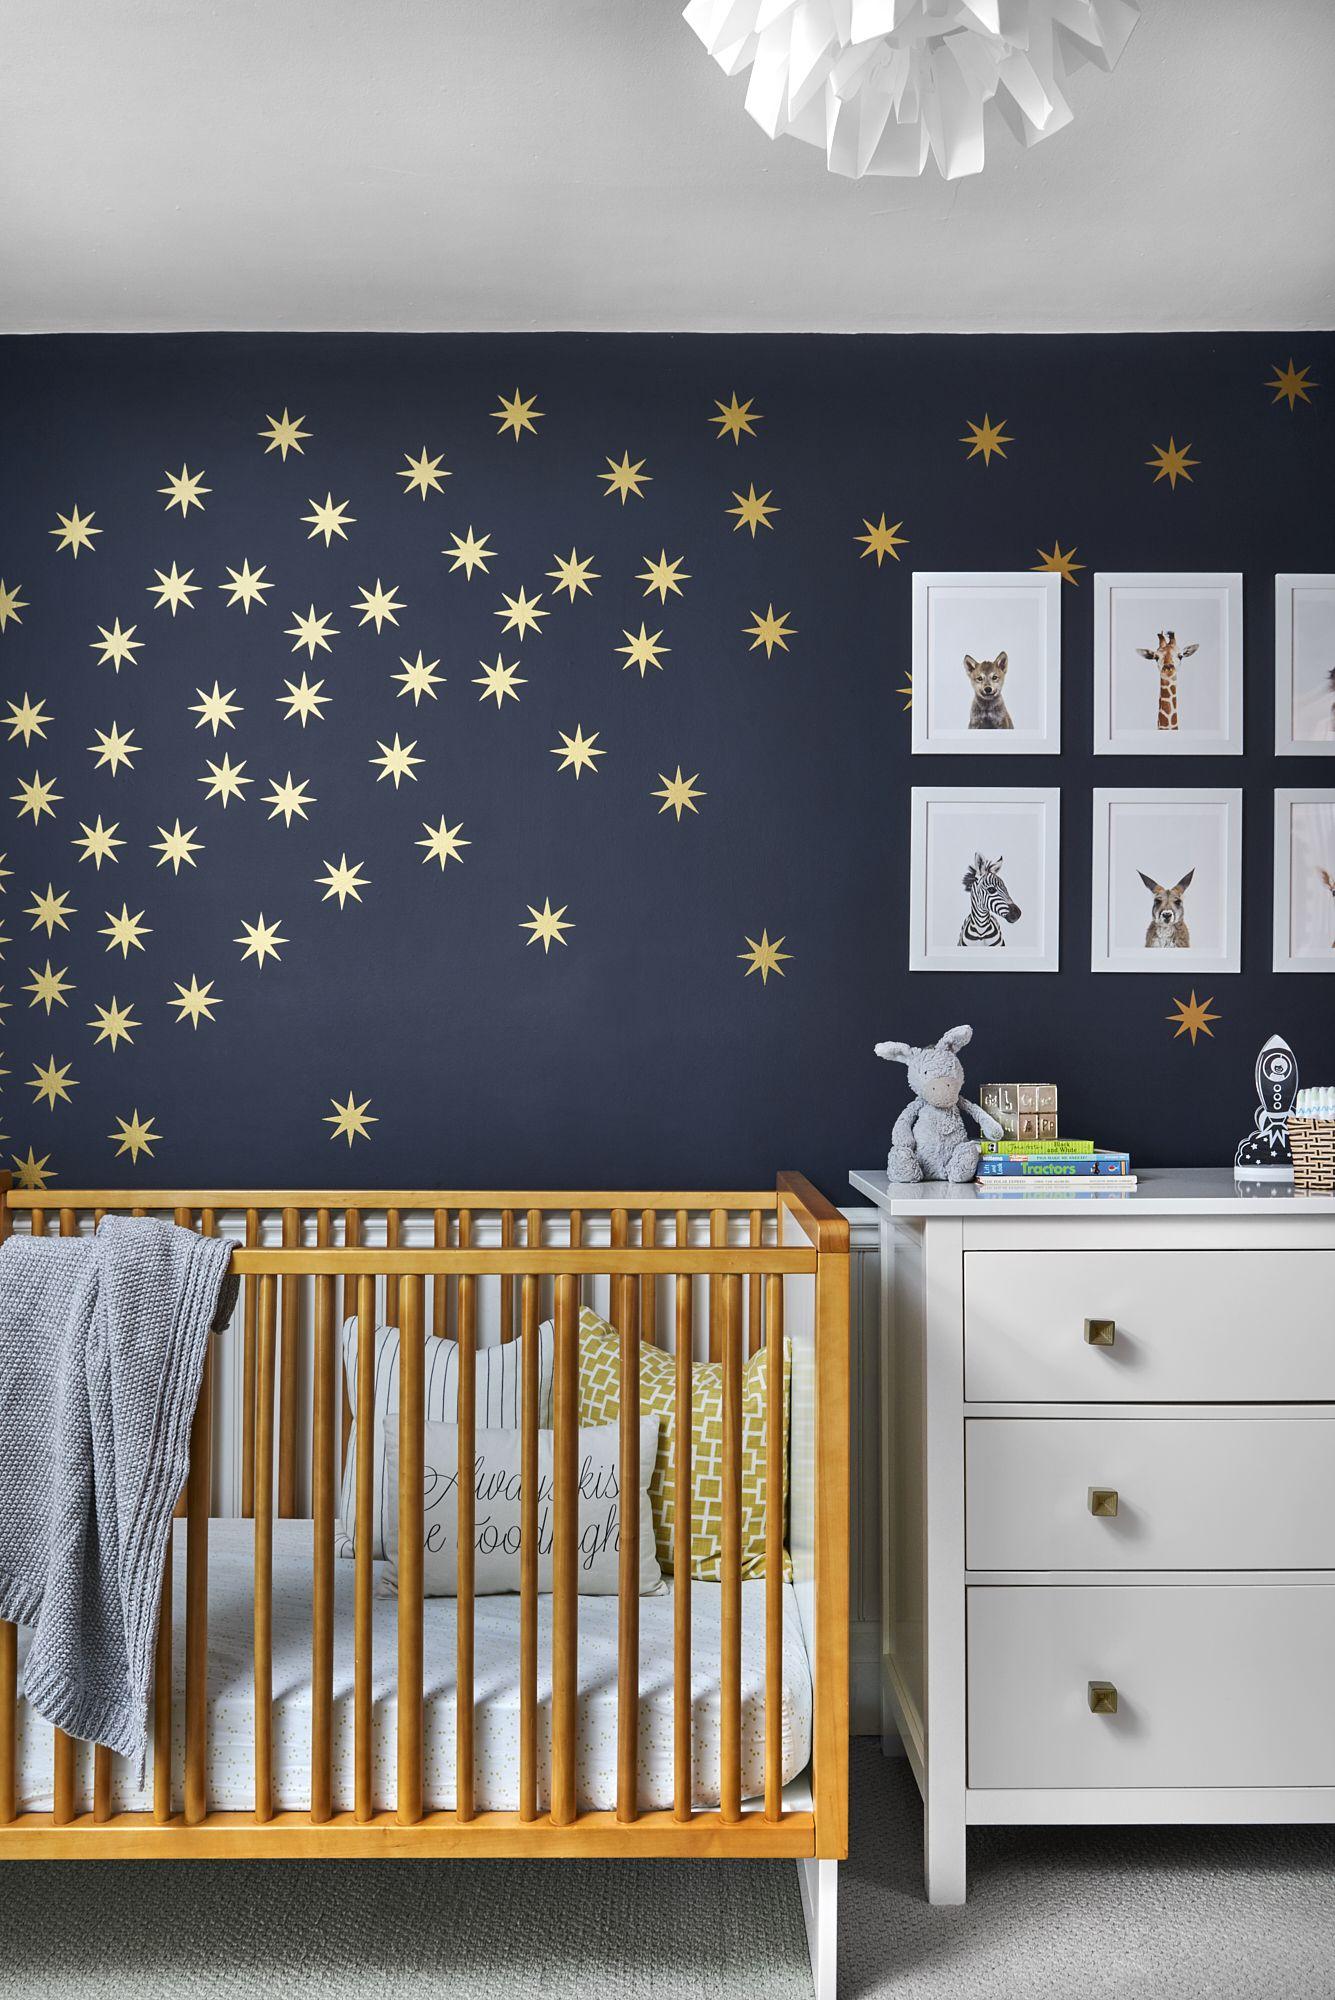 Beautiful Nursery Decor With Navy Blue Wall And Stars Decal Boys Room Blue Beautiful Nursery Decor Boy Nursery Colors